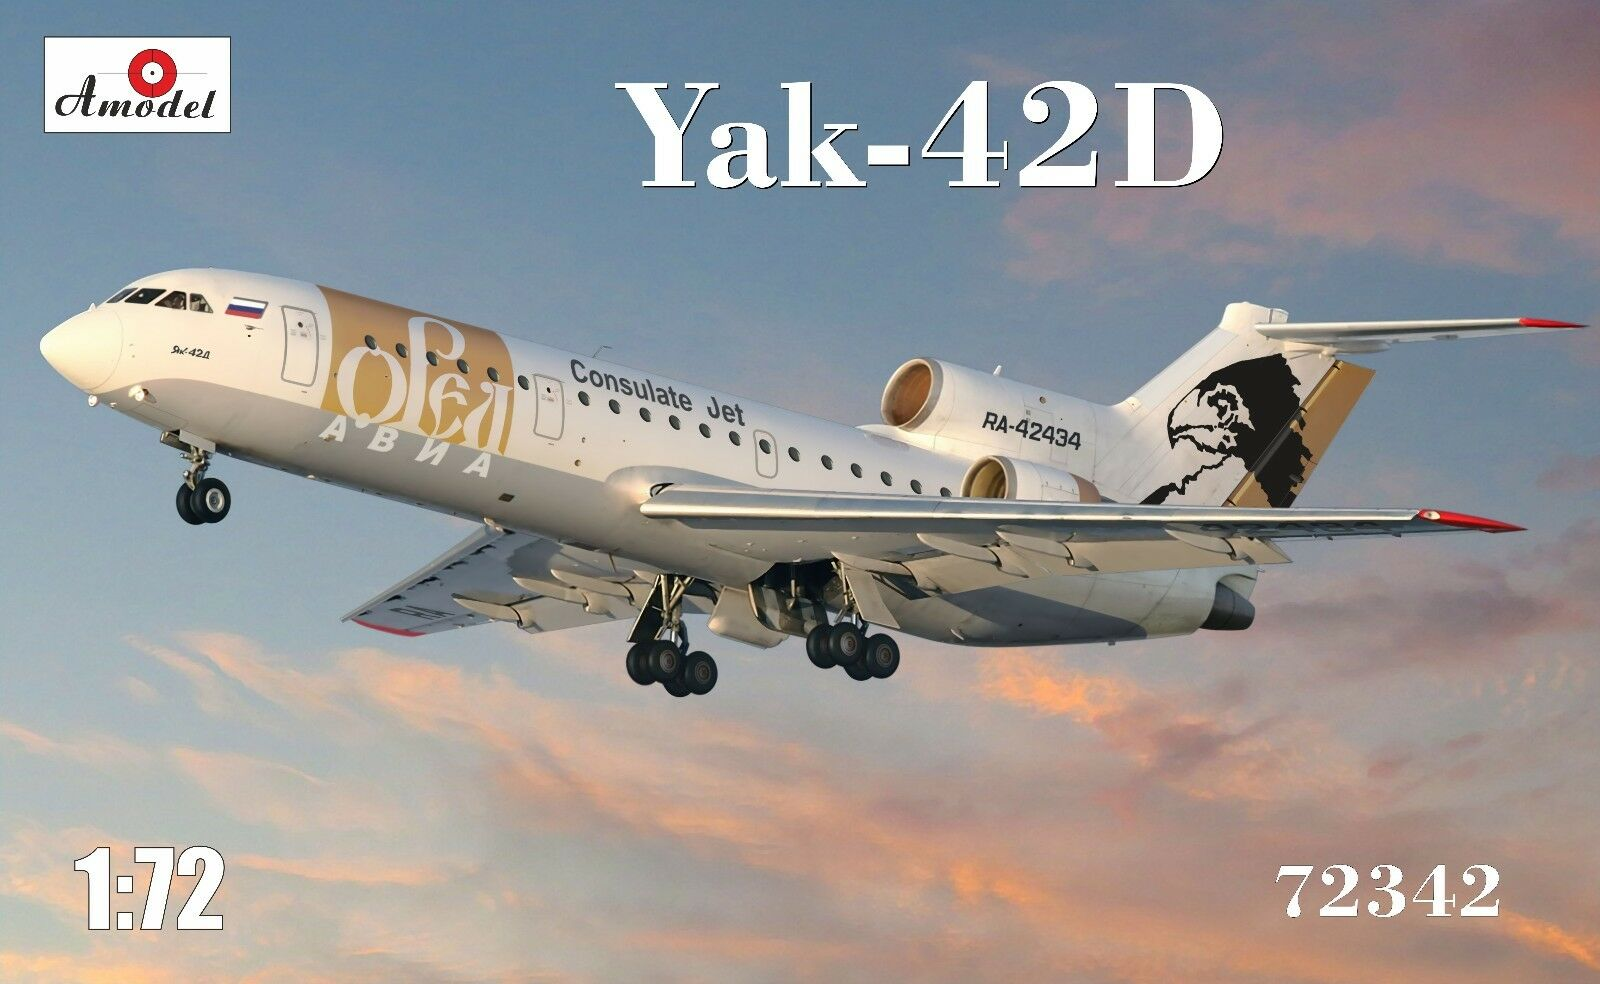 1 72 Yakovlev Yak-42D 'Consulate Jet' Fuselage & wings epoxy resin_ Amodel new